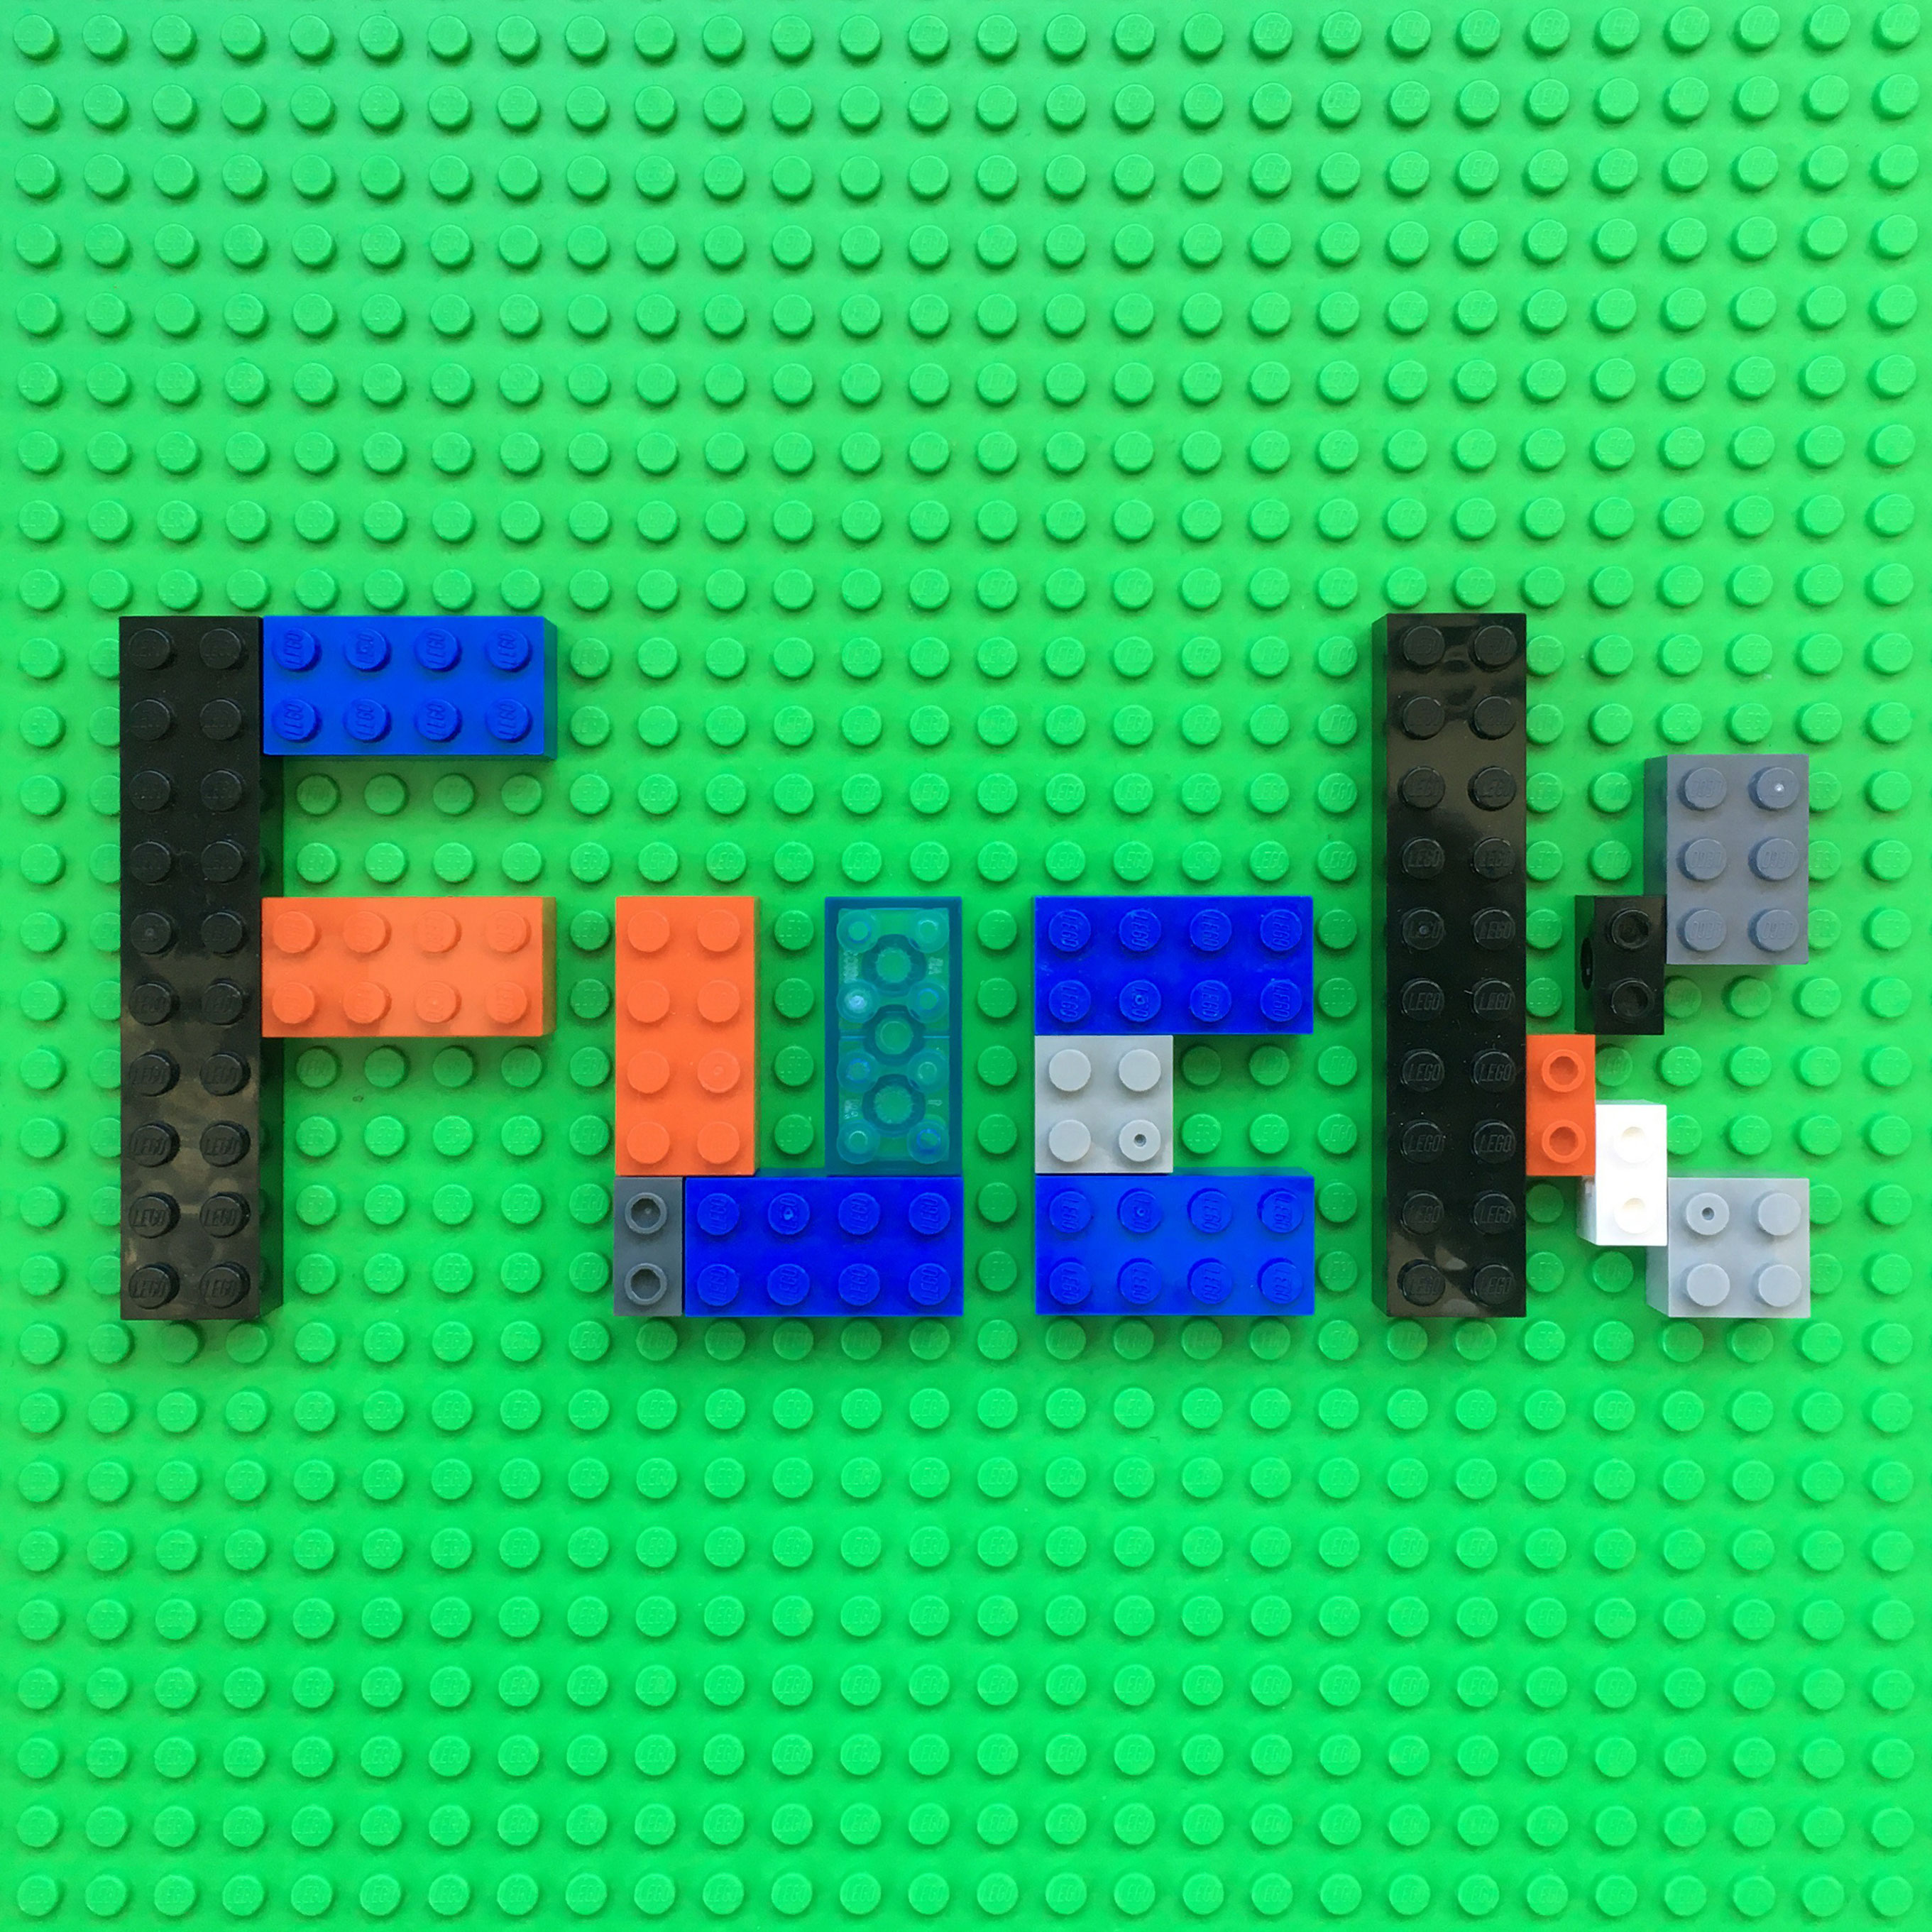 fucktype-6